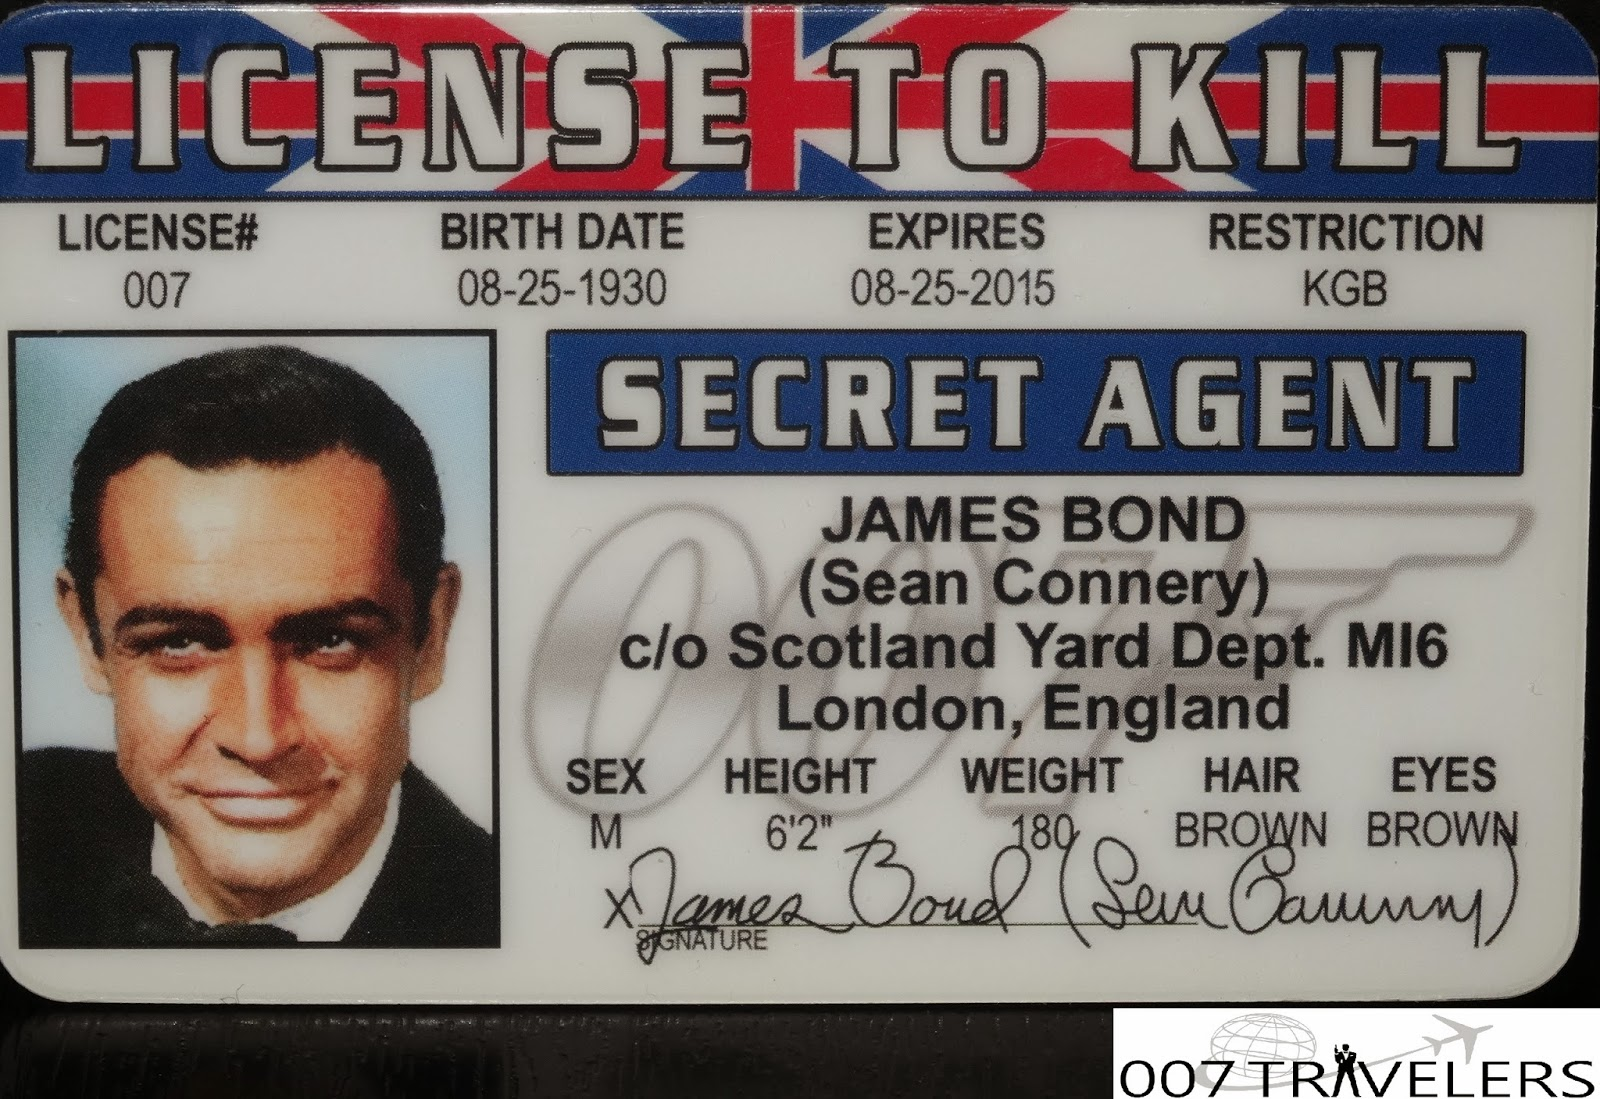 spy id card template - 007 travelers 007 item license to kill id card